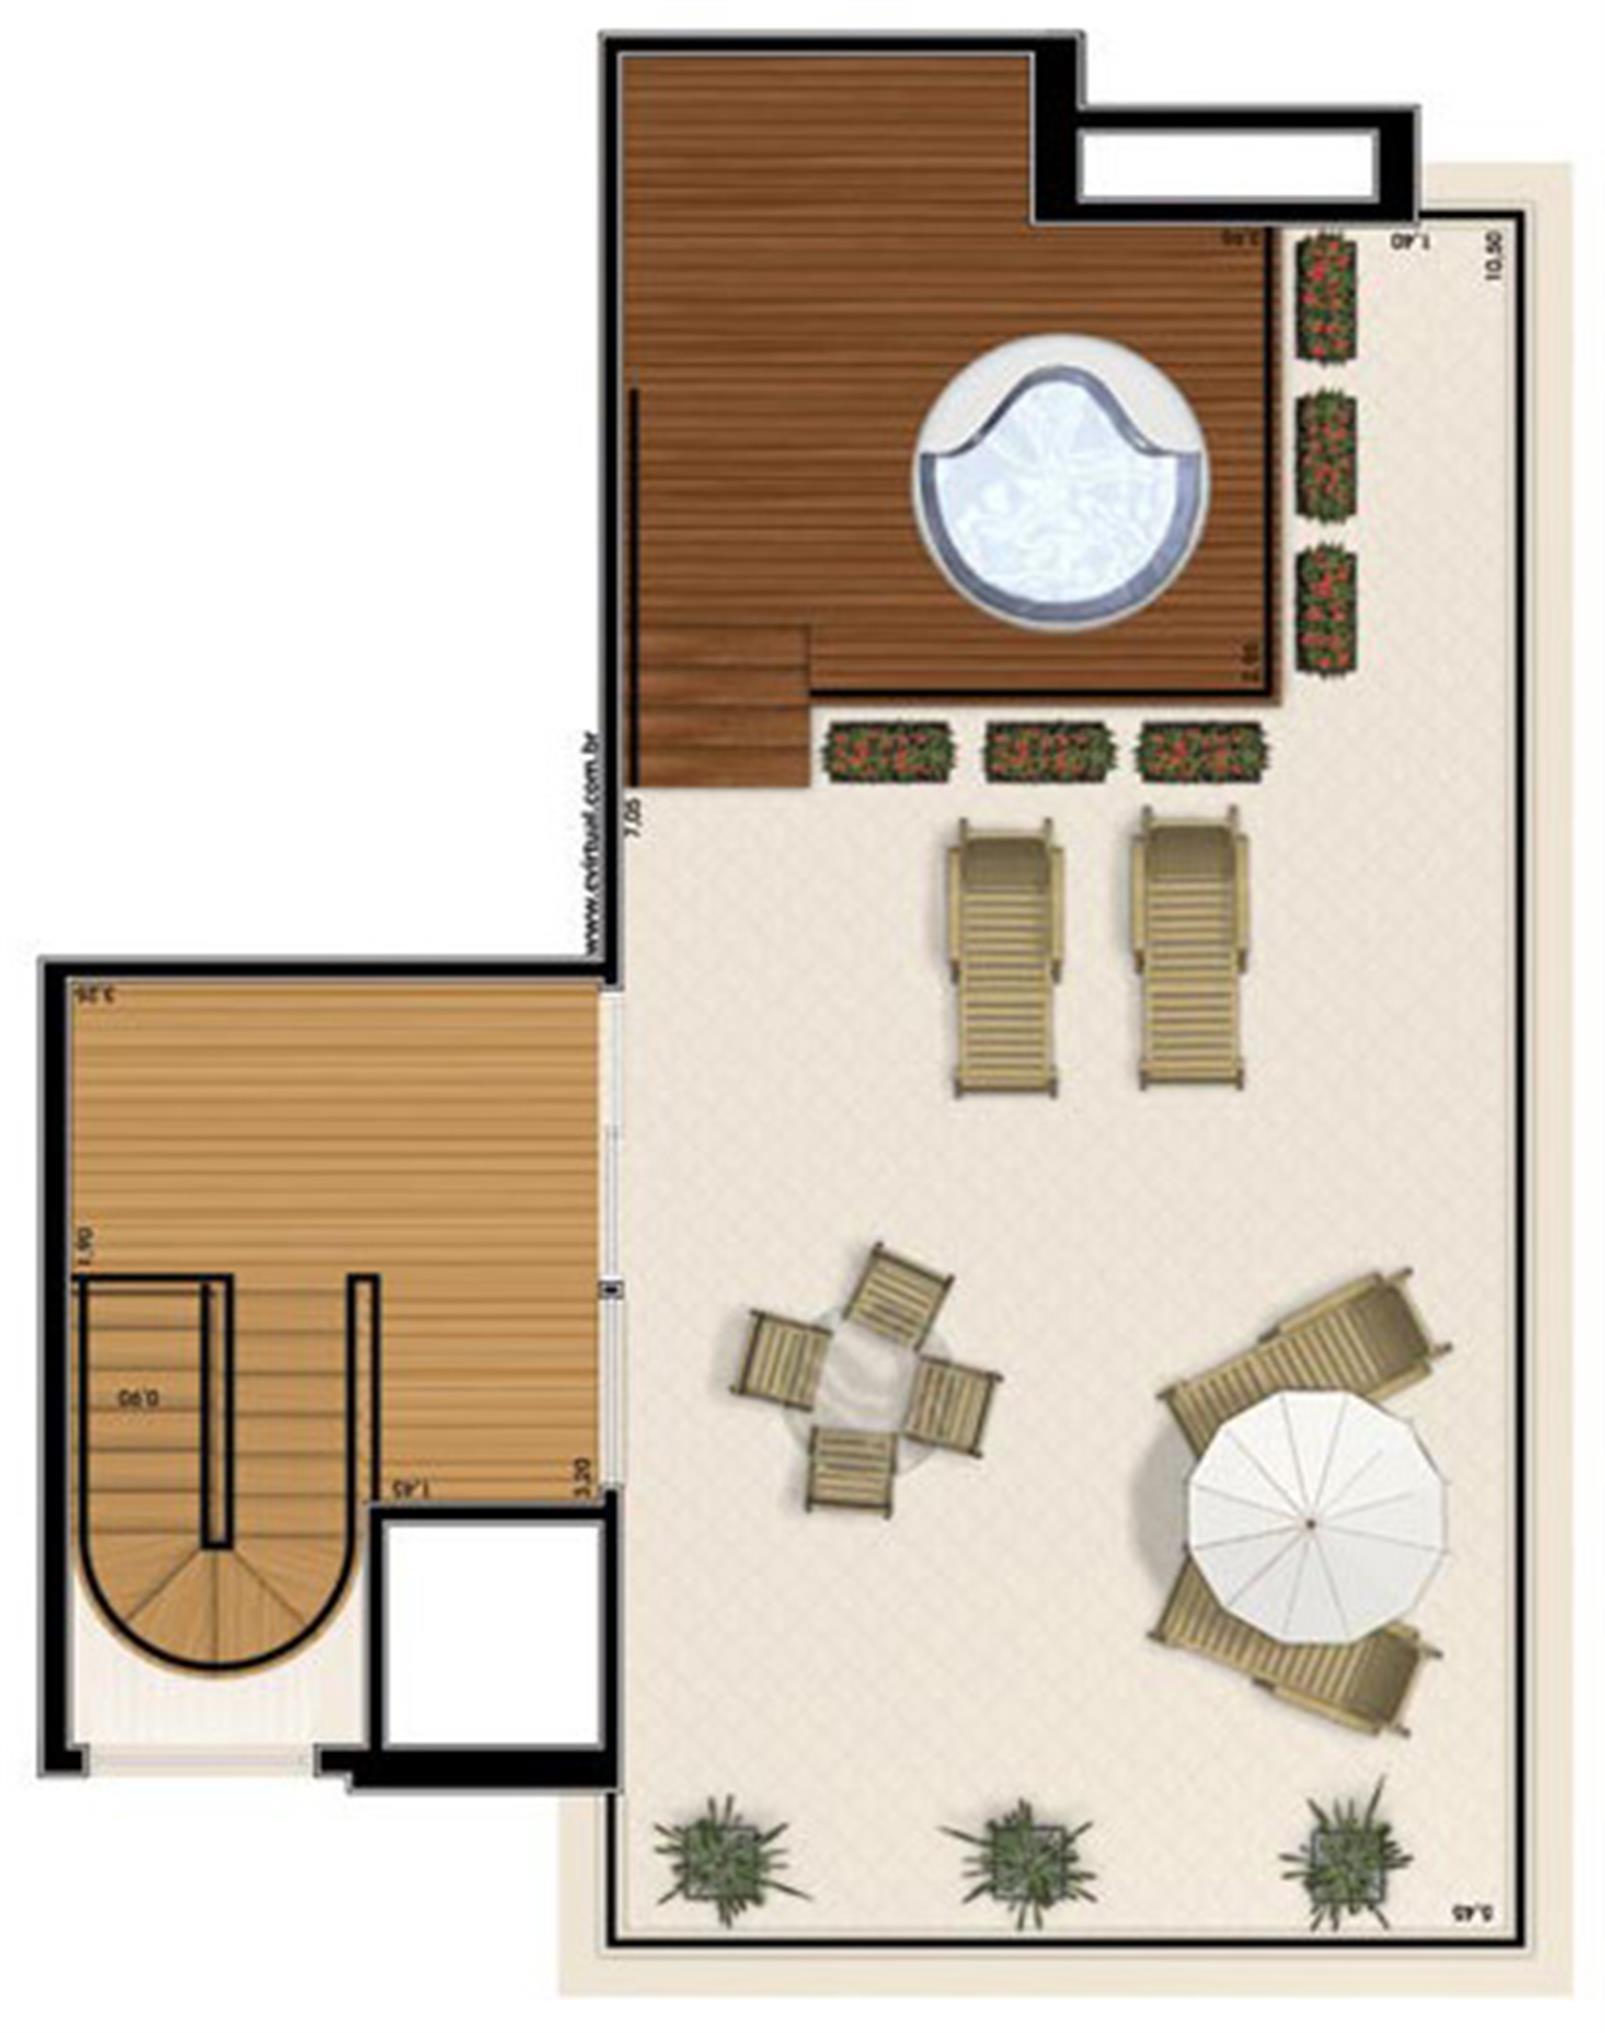 Planta-tipo - 3 suítes - 300m² privativos - Piso Superior (Verbera Triple Floor) | Essência Alphaville – Apartamentoem  Alphaville - Barueri - São Paulo